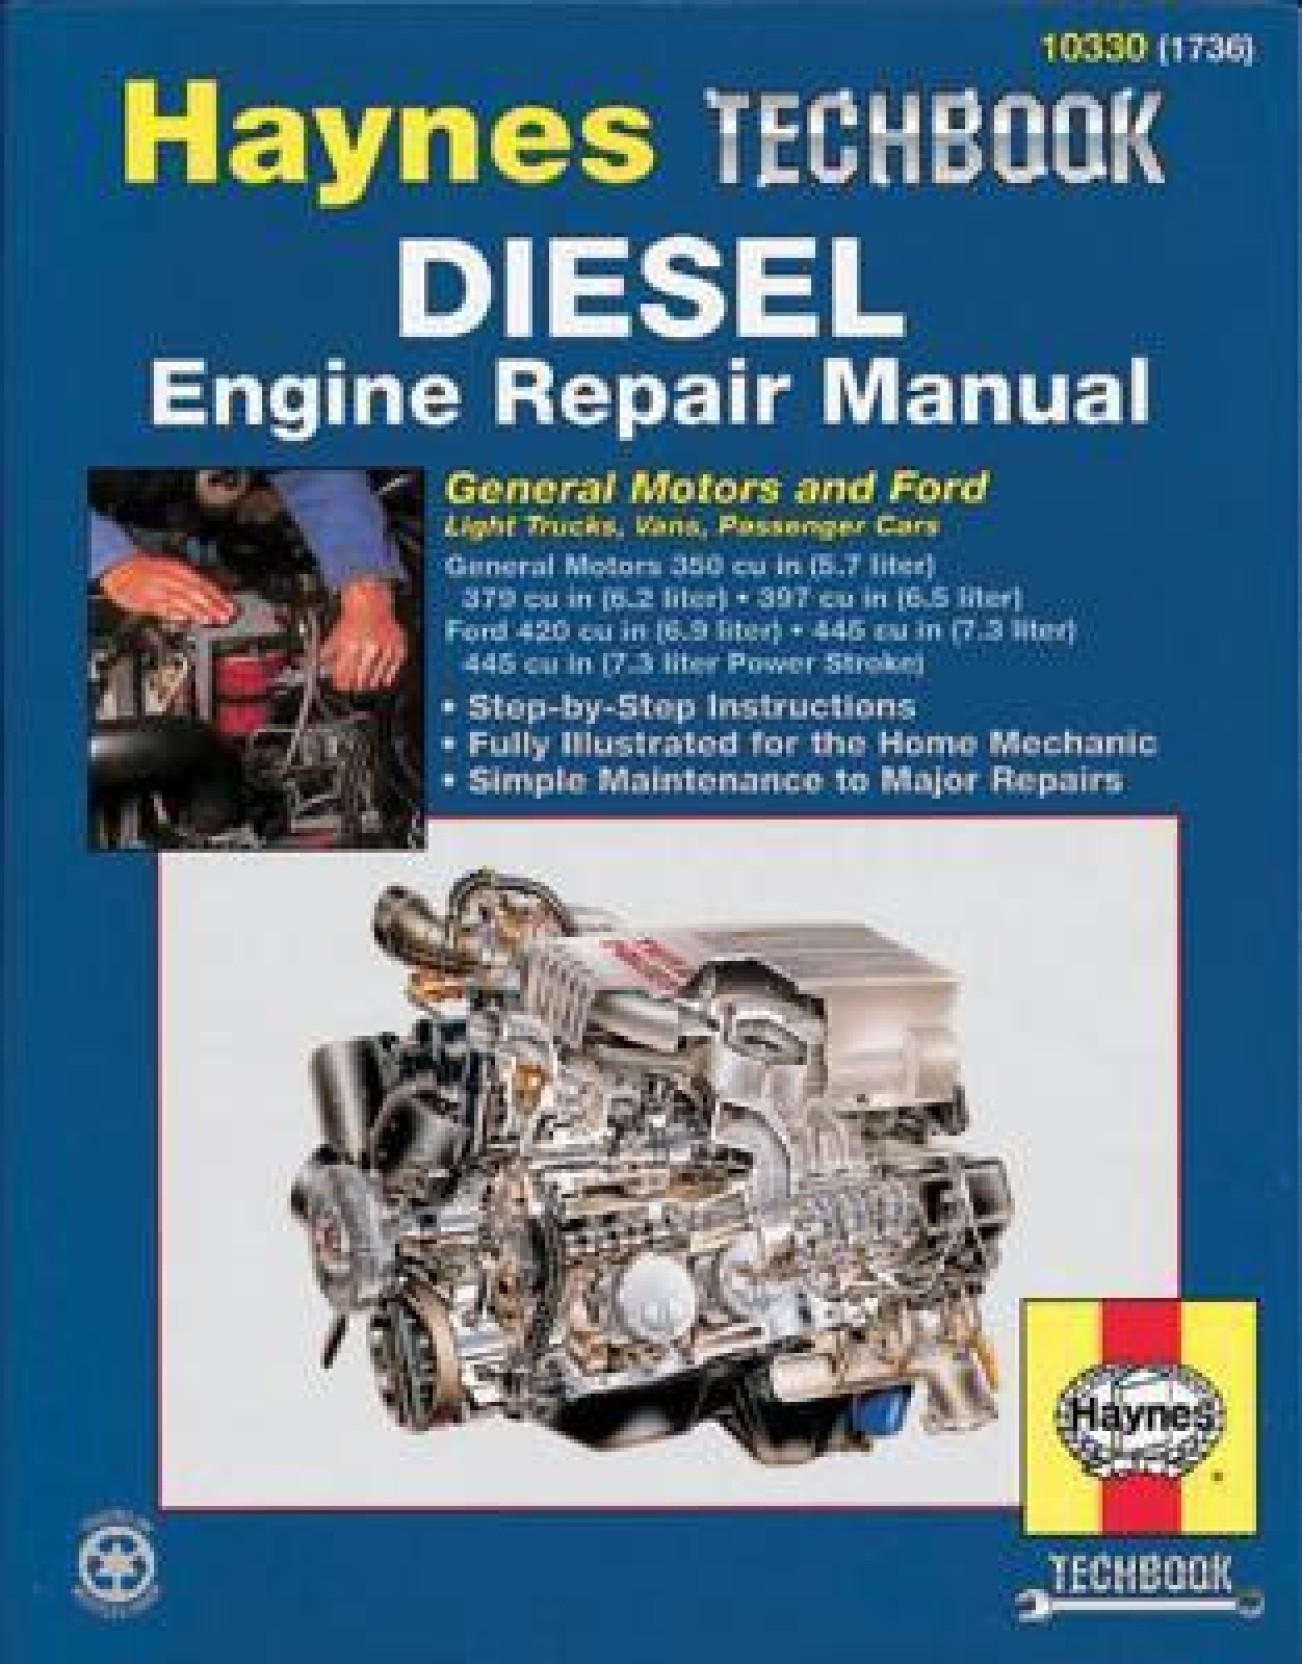 Diesel Engine Repair Manual: General Motors and Ford Light Trucks, Vans,  Passenger Cars. ADD TO CART